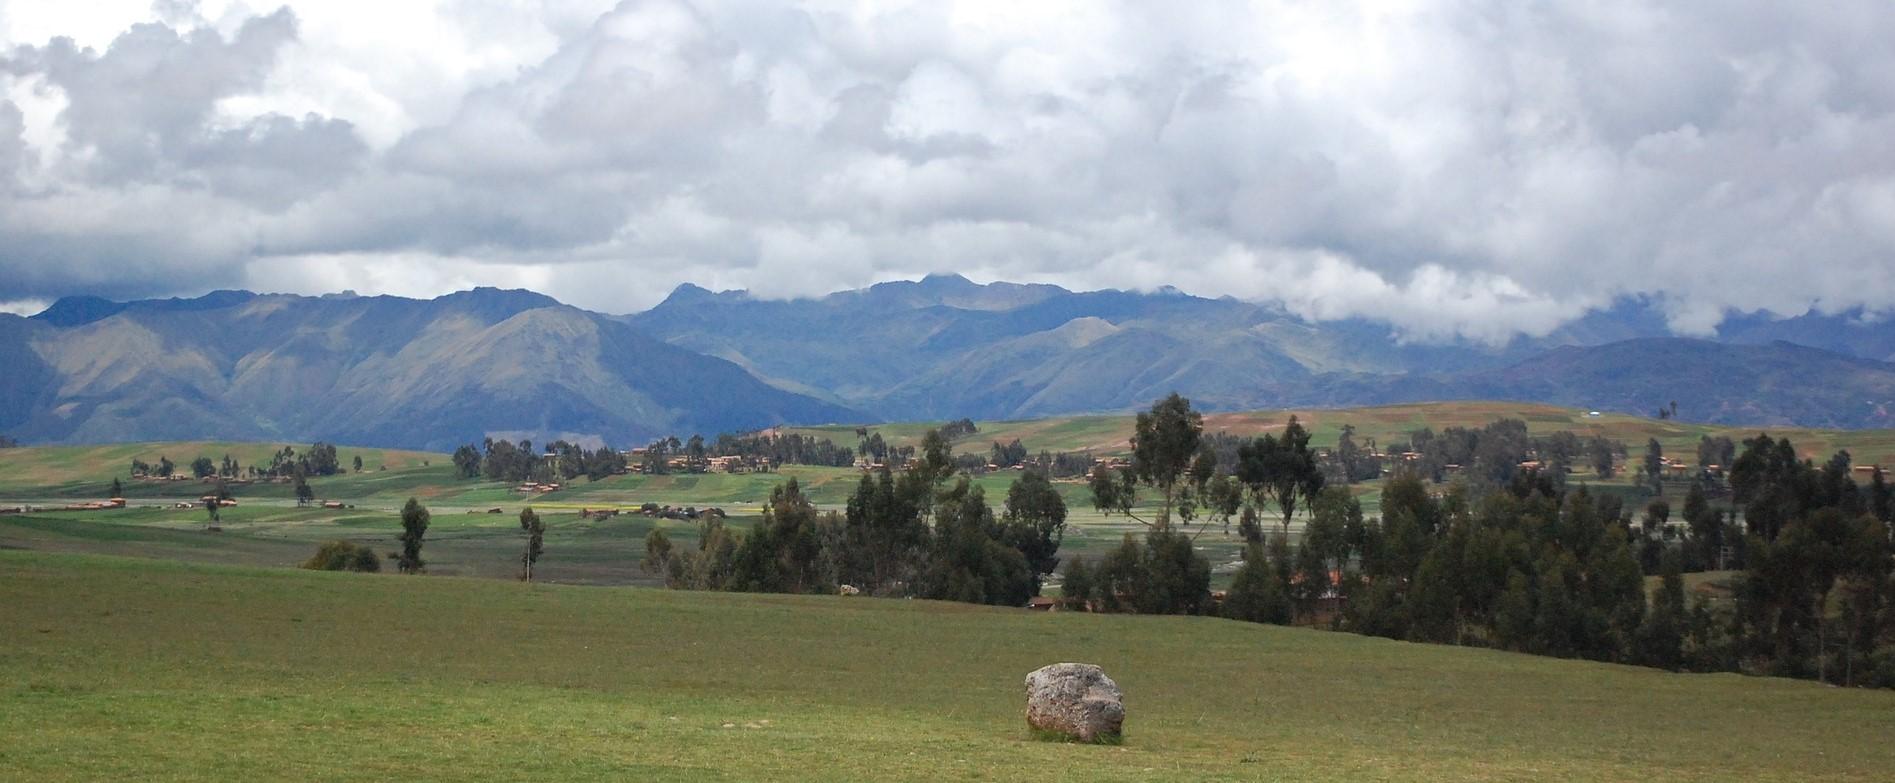 Mountains in Spokane, Washington   Breast Cancer Car Donations